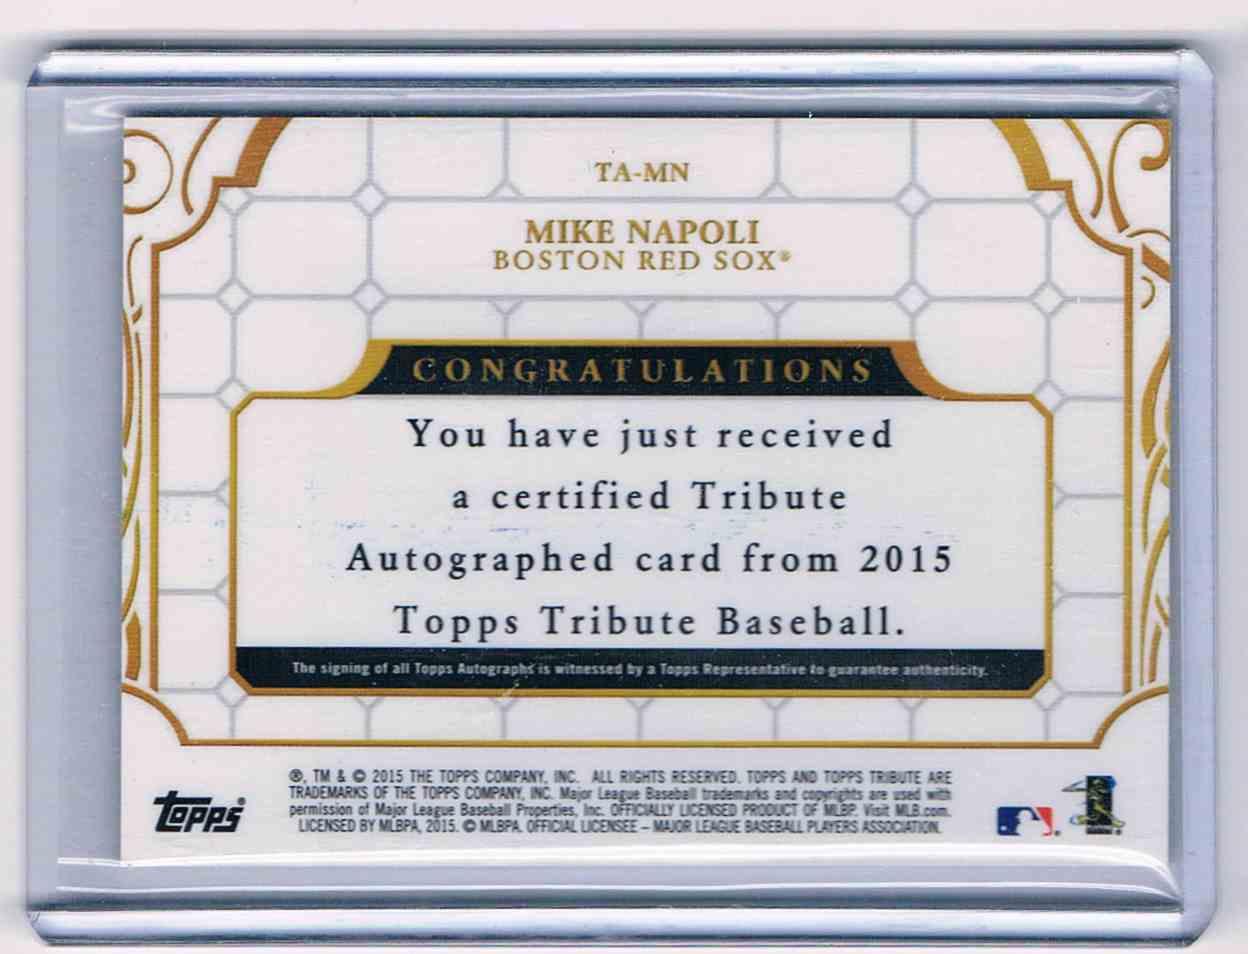 2015 Topps Tribute Mike Napoli #TA-MN card back image